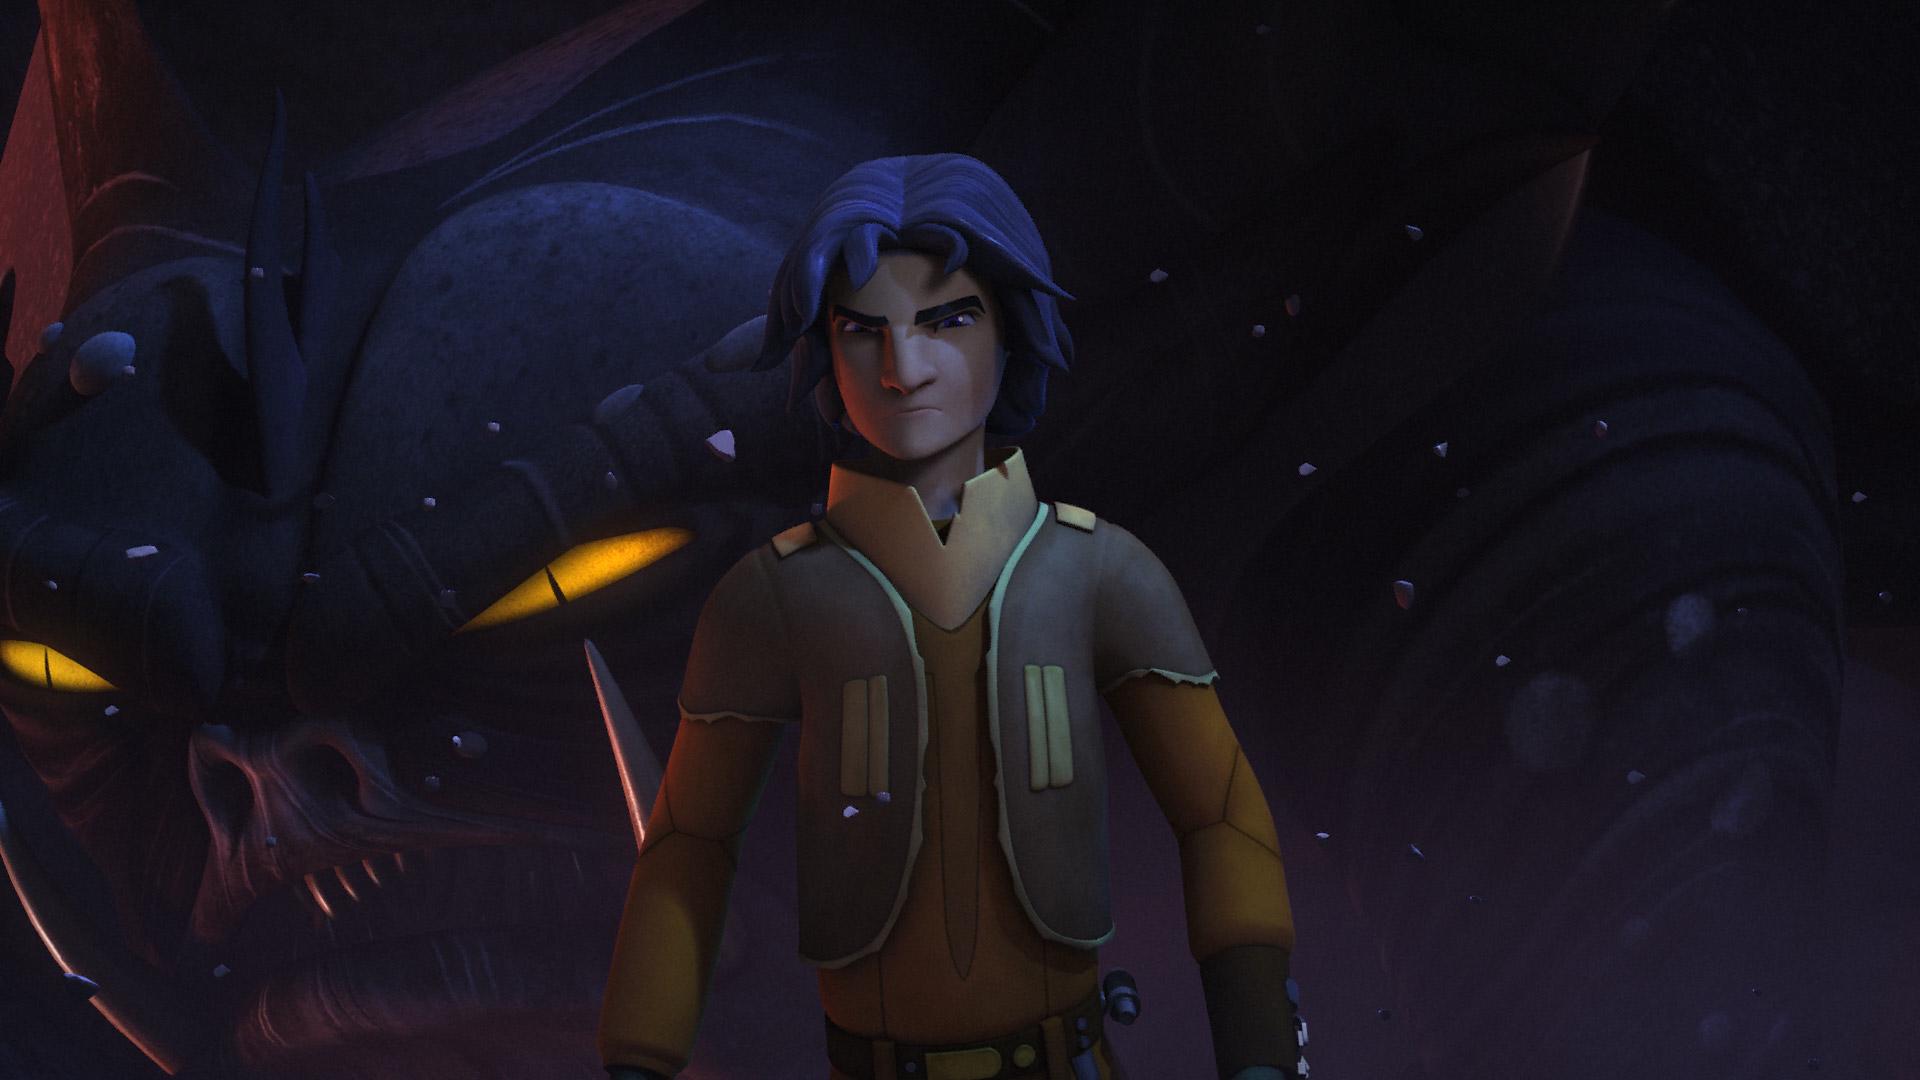 Star Wars Rebels Season One Wookieepedia The Star Wars Wiki